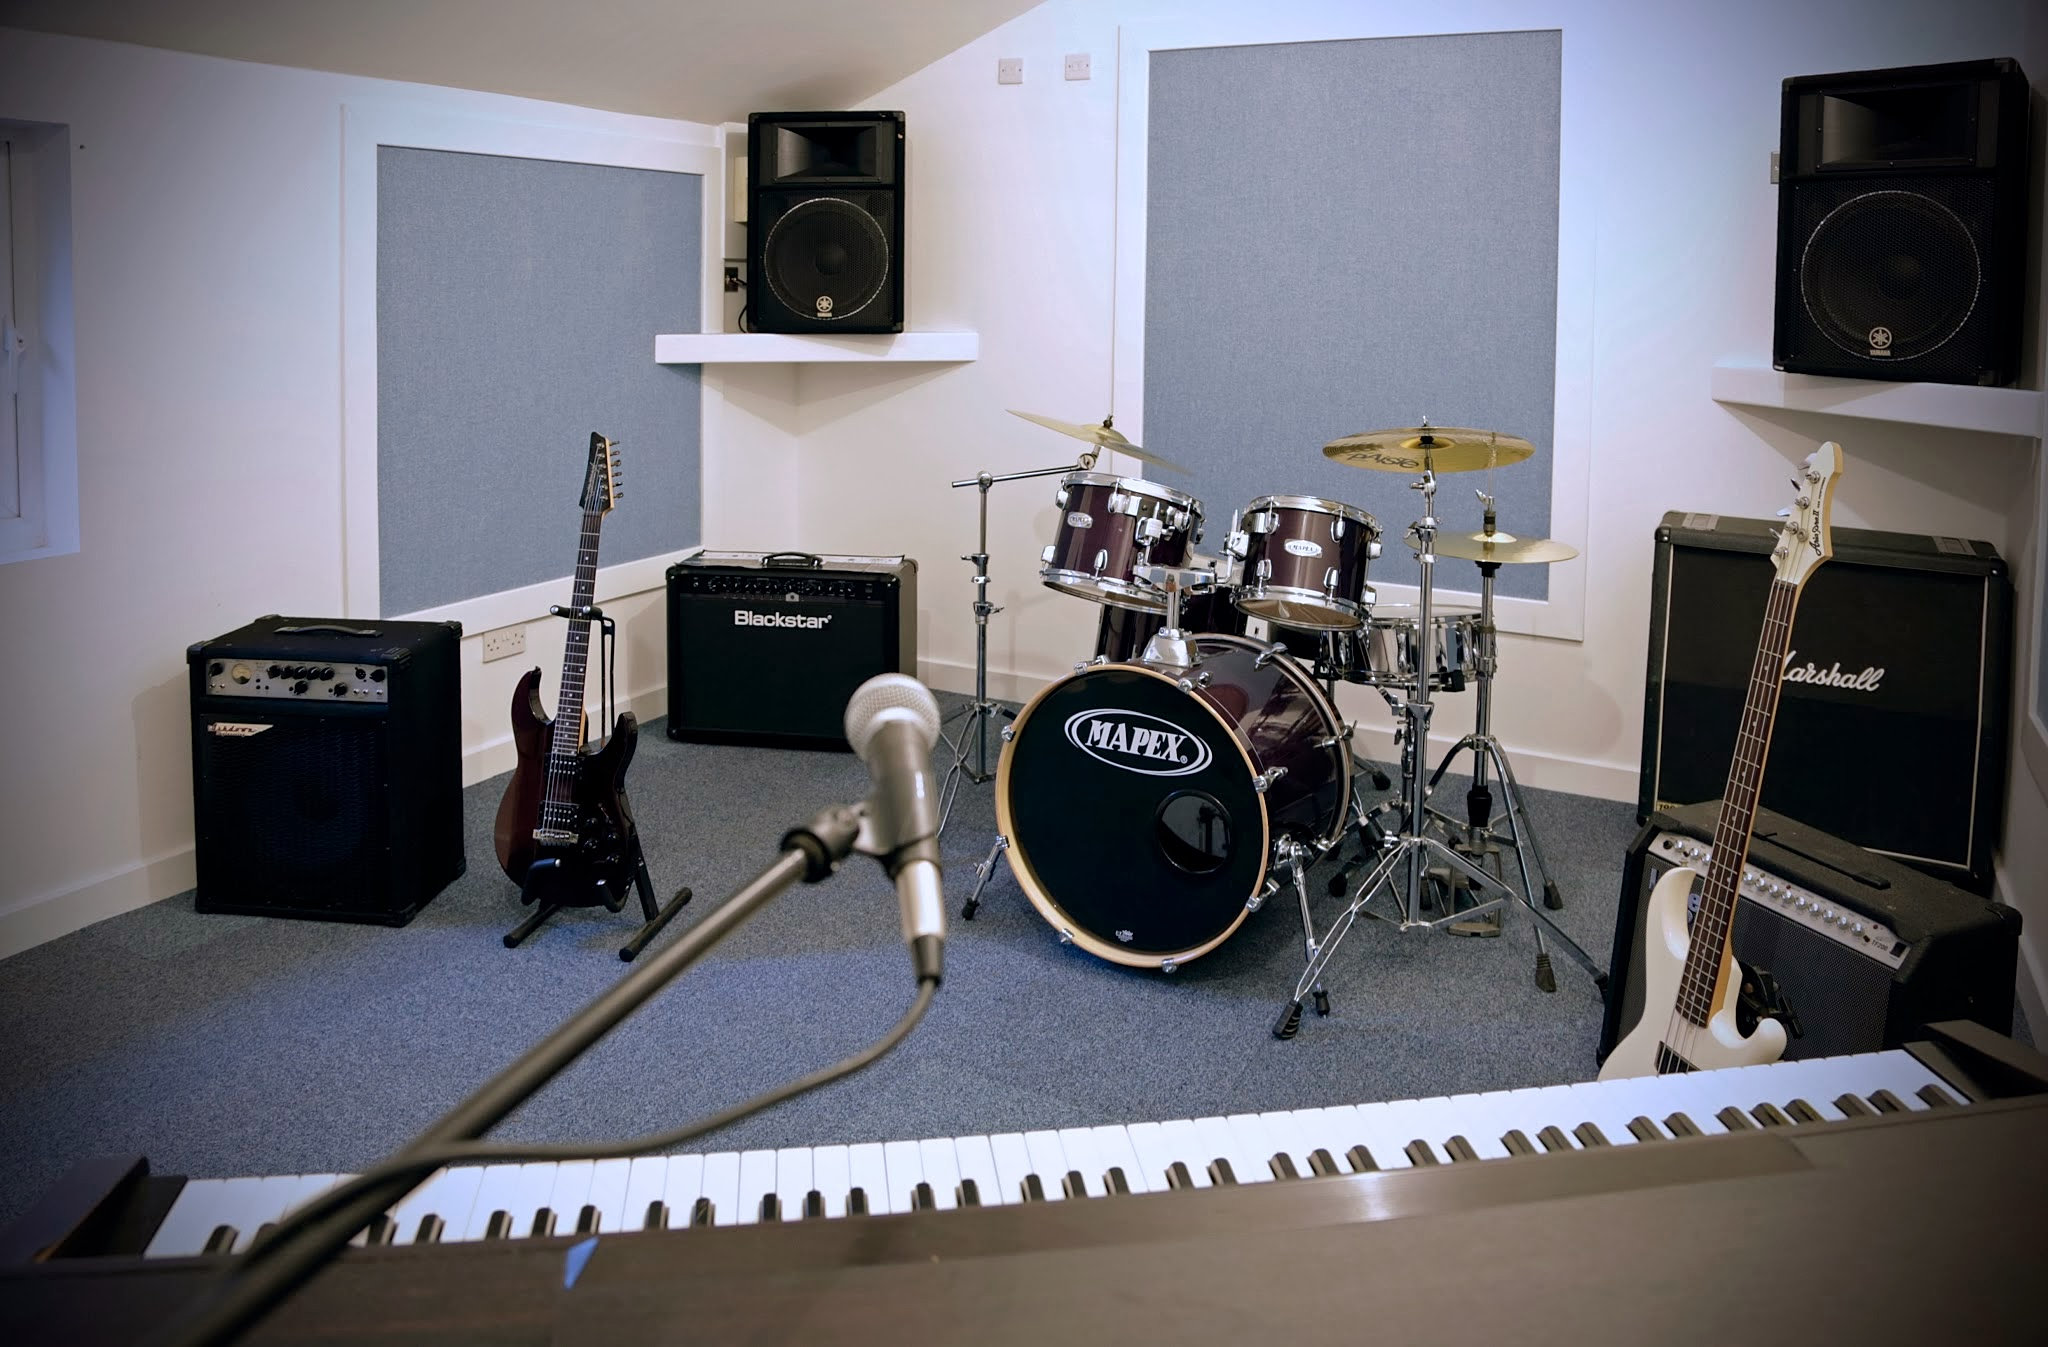 langleistdios rehearsal studios in kent. Black Bedroom Furniture Sets. Home Design Ideas